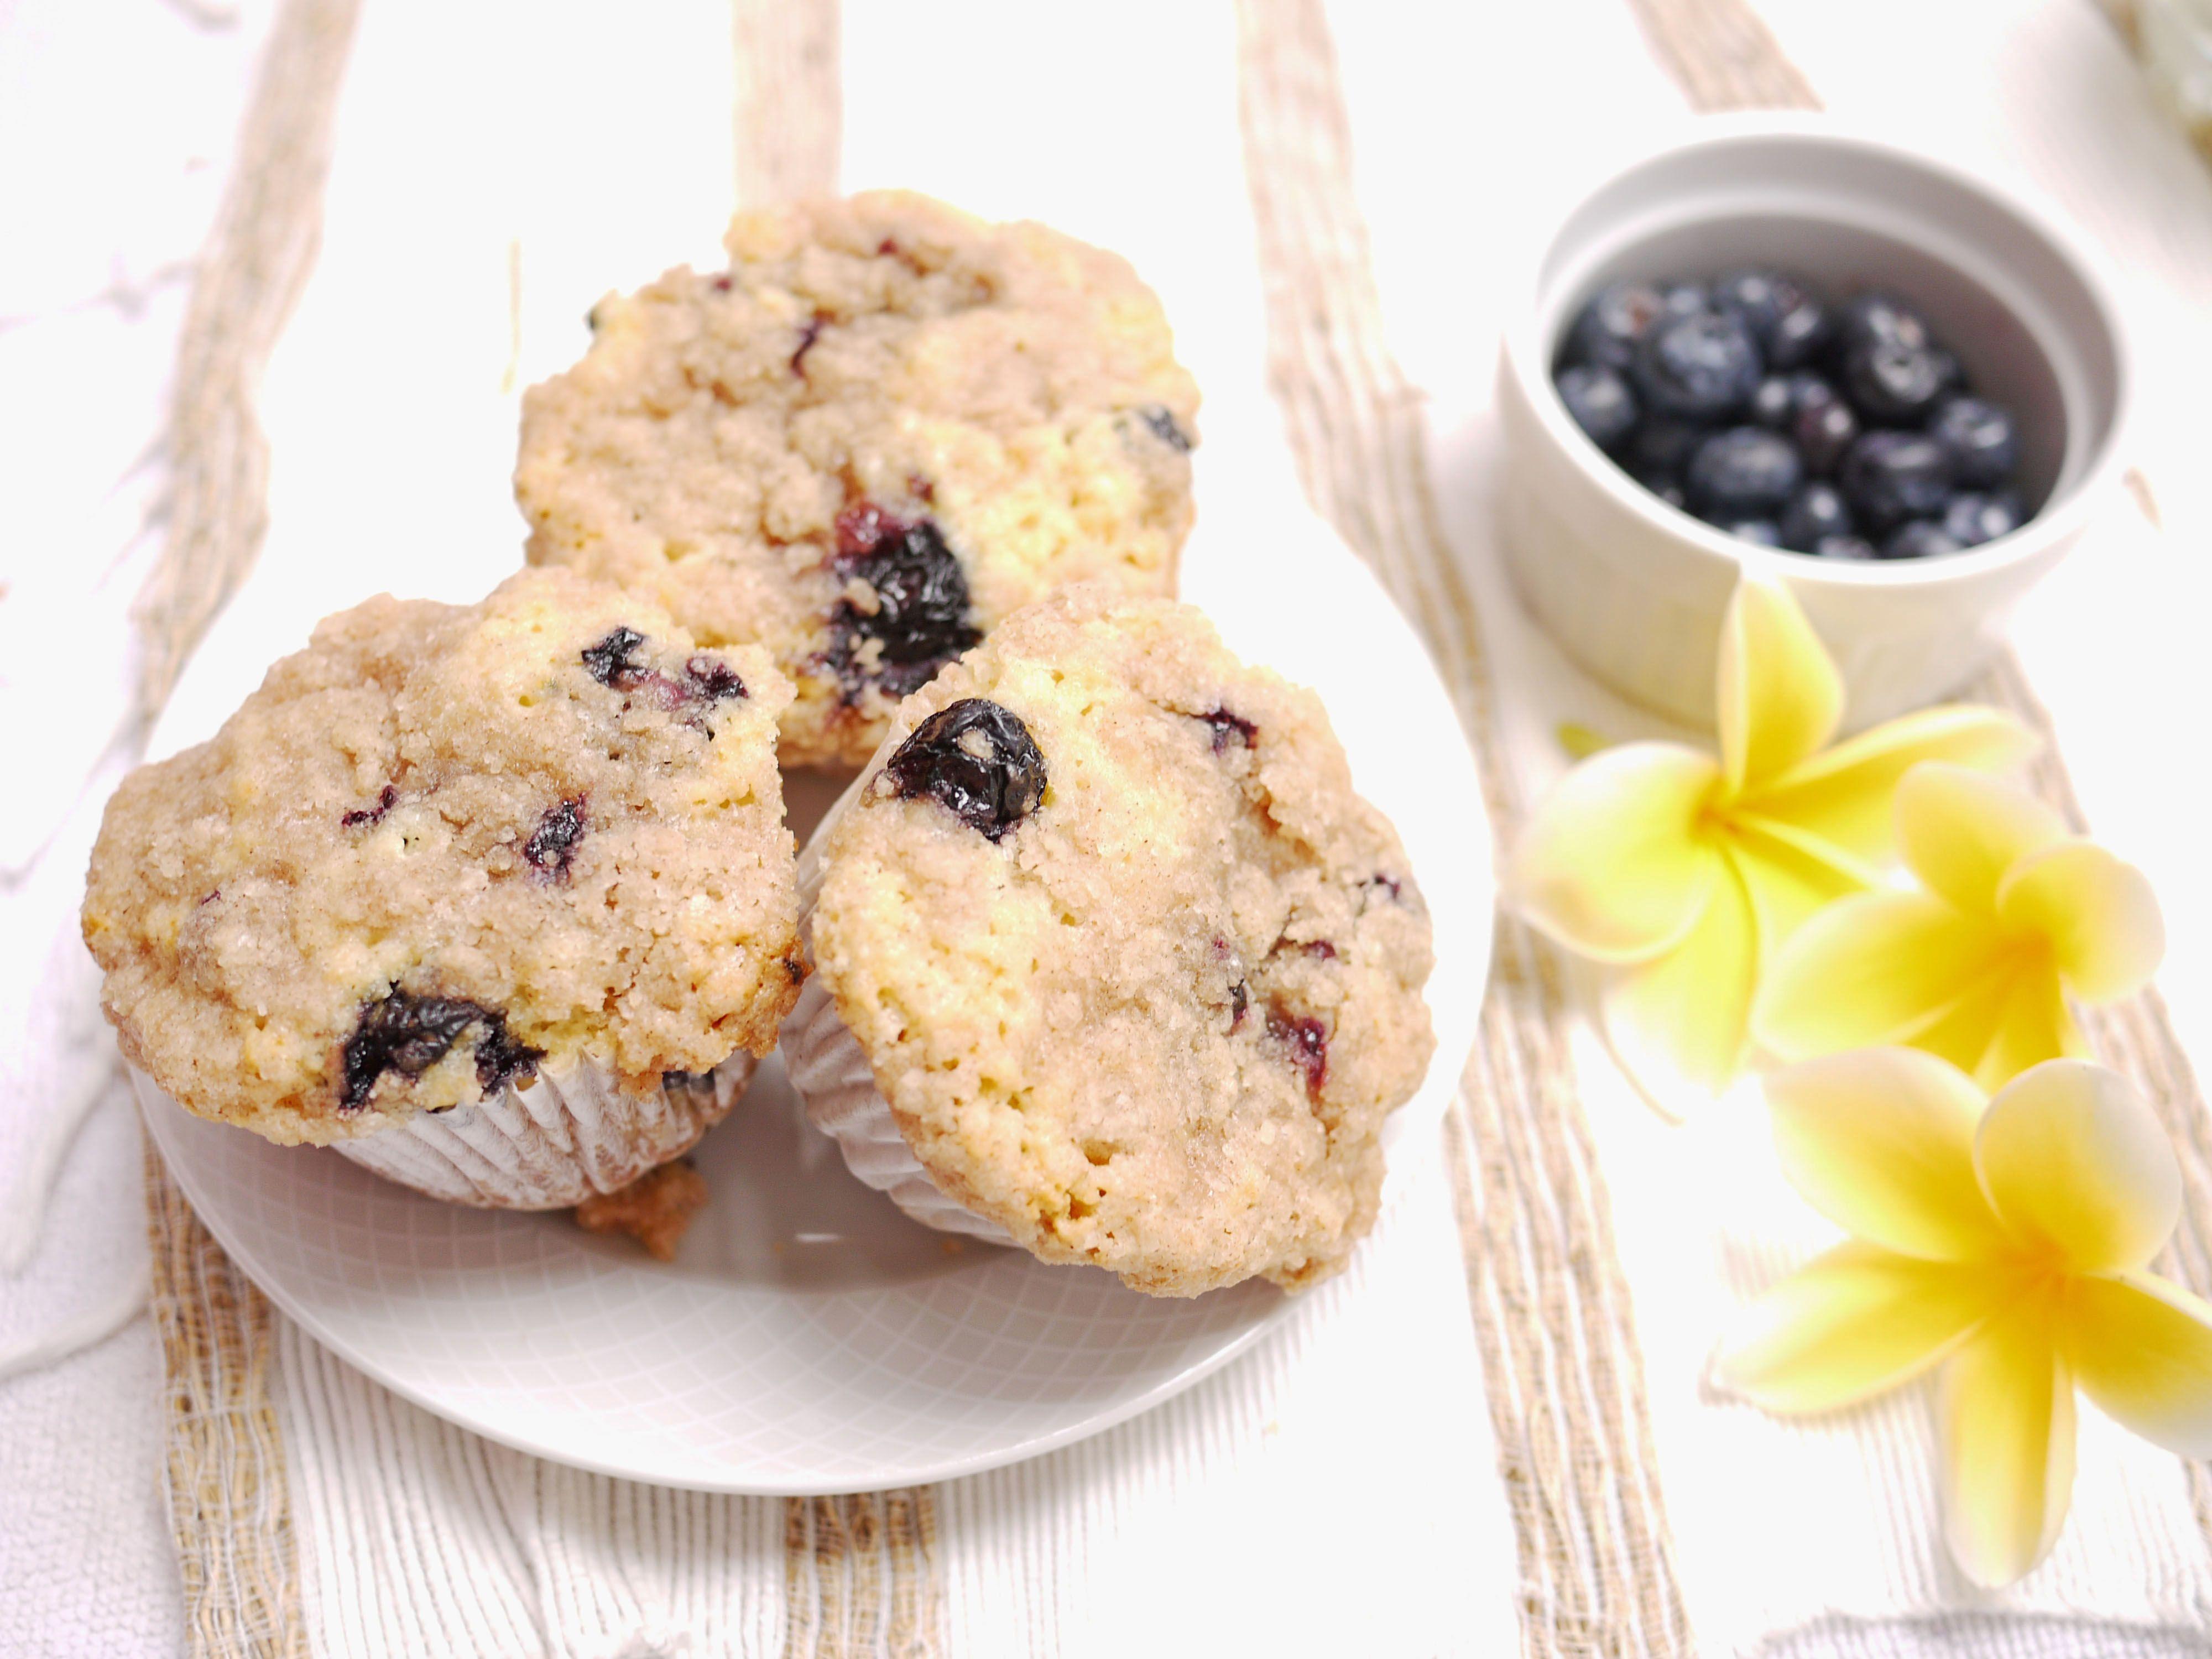 Of Blueberry Muffins and Starbucks Starbucks recipes